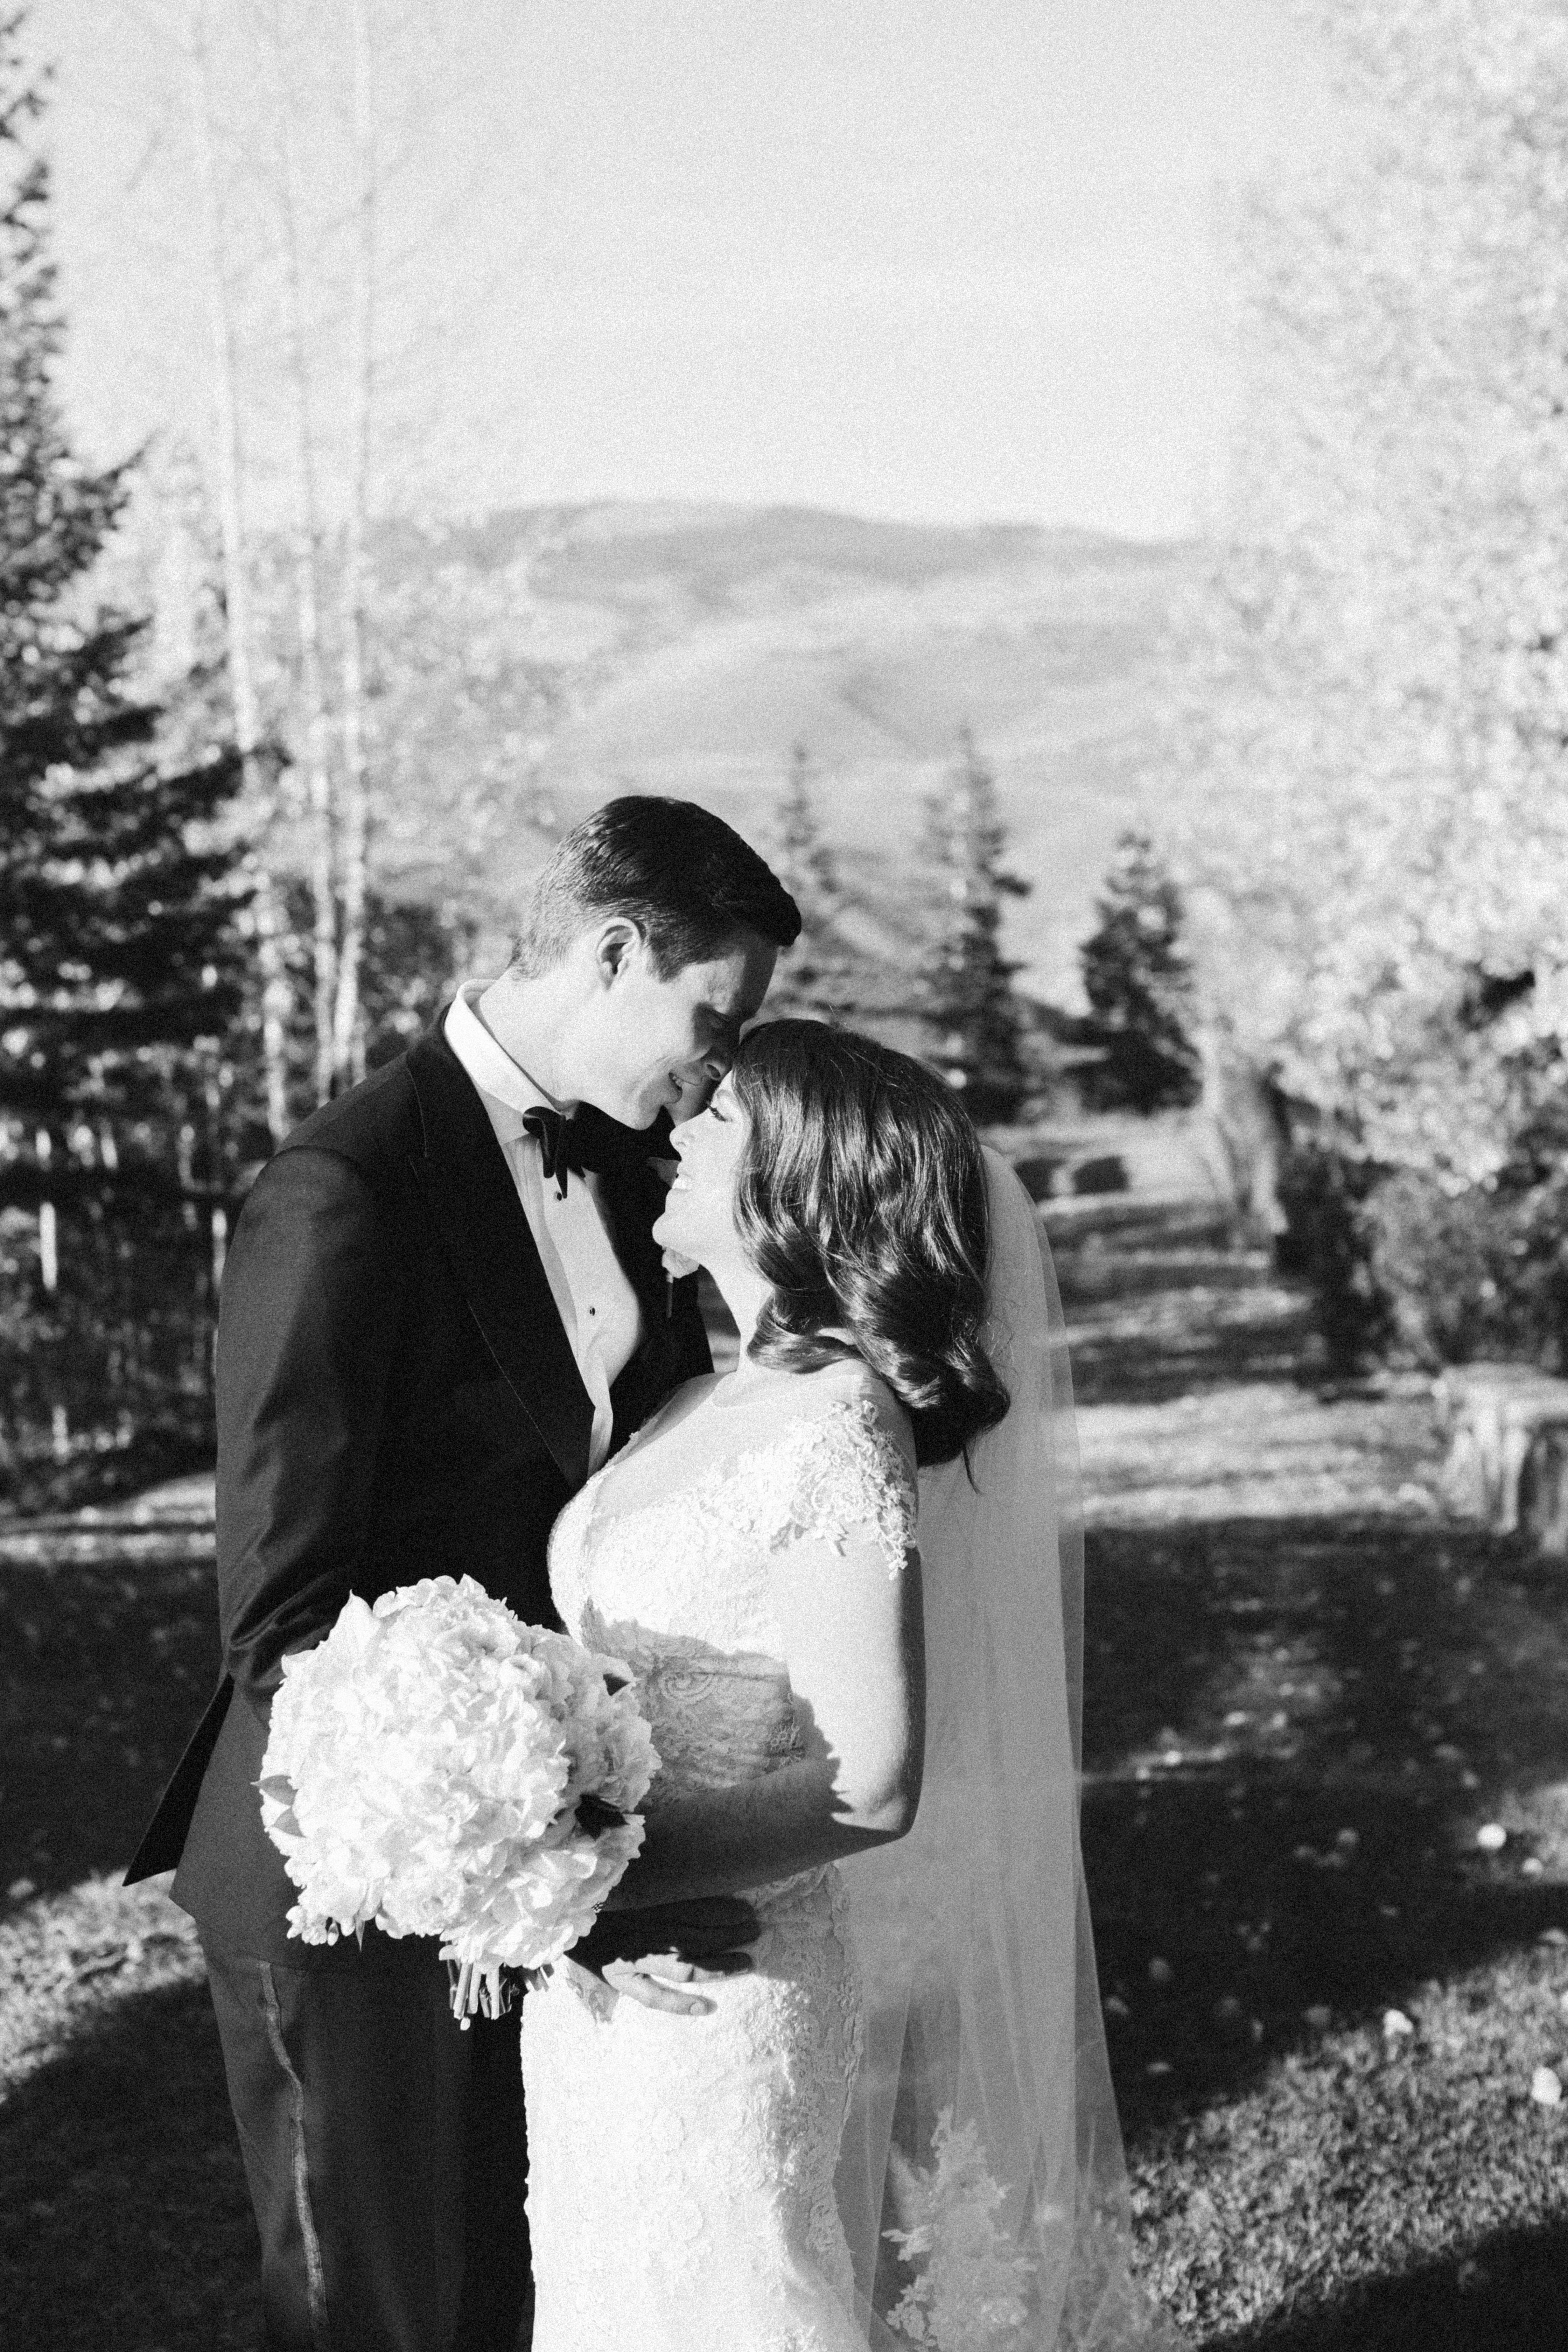 Ritz-Carlton-Bachelor-Gulch-Beaver-Creek-Colorado-Fall-Wedding-Bride-Groom-Skiers-Bridge-Black-and-White